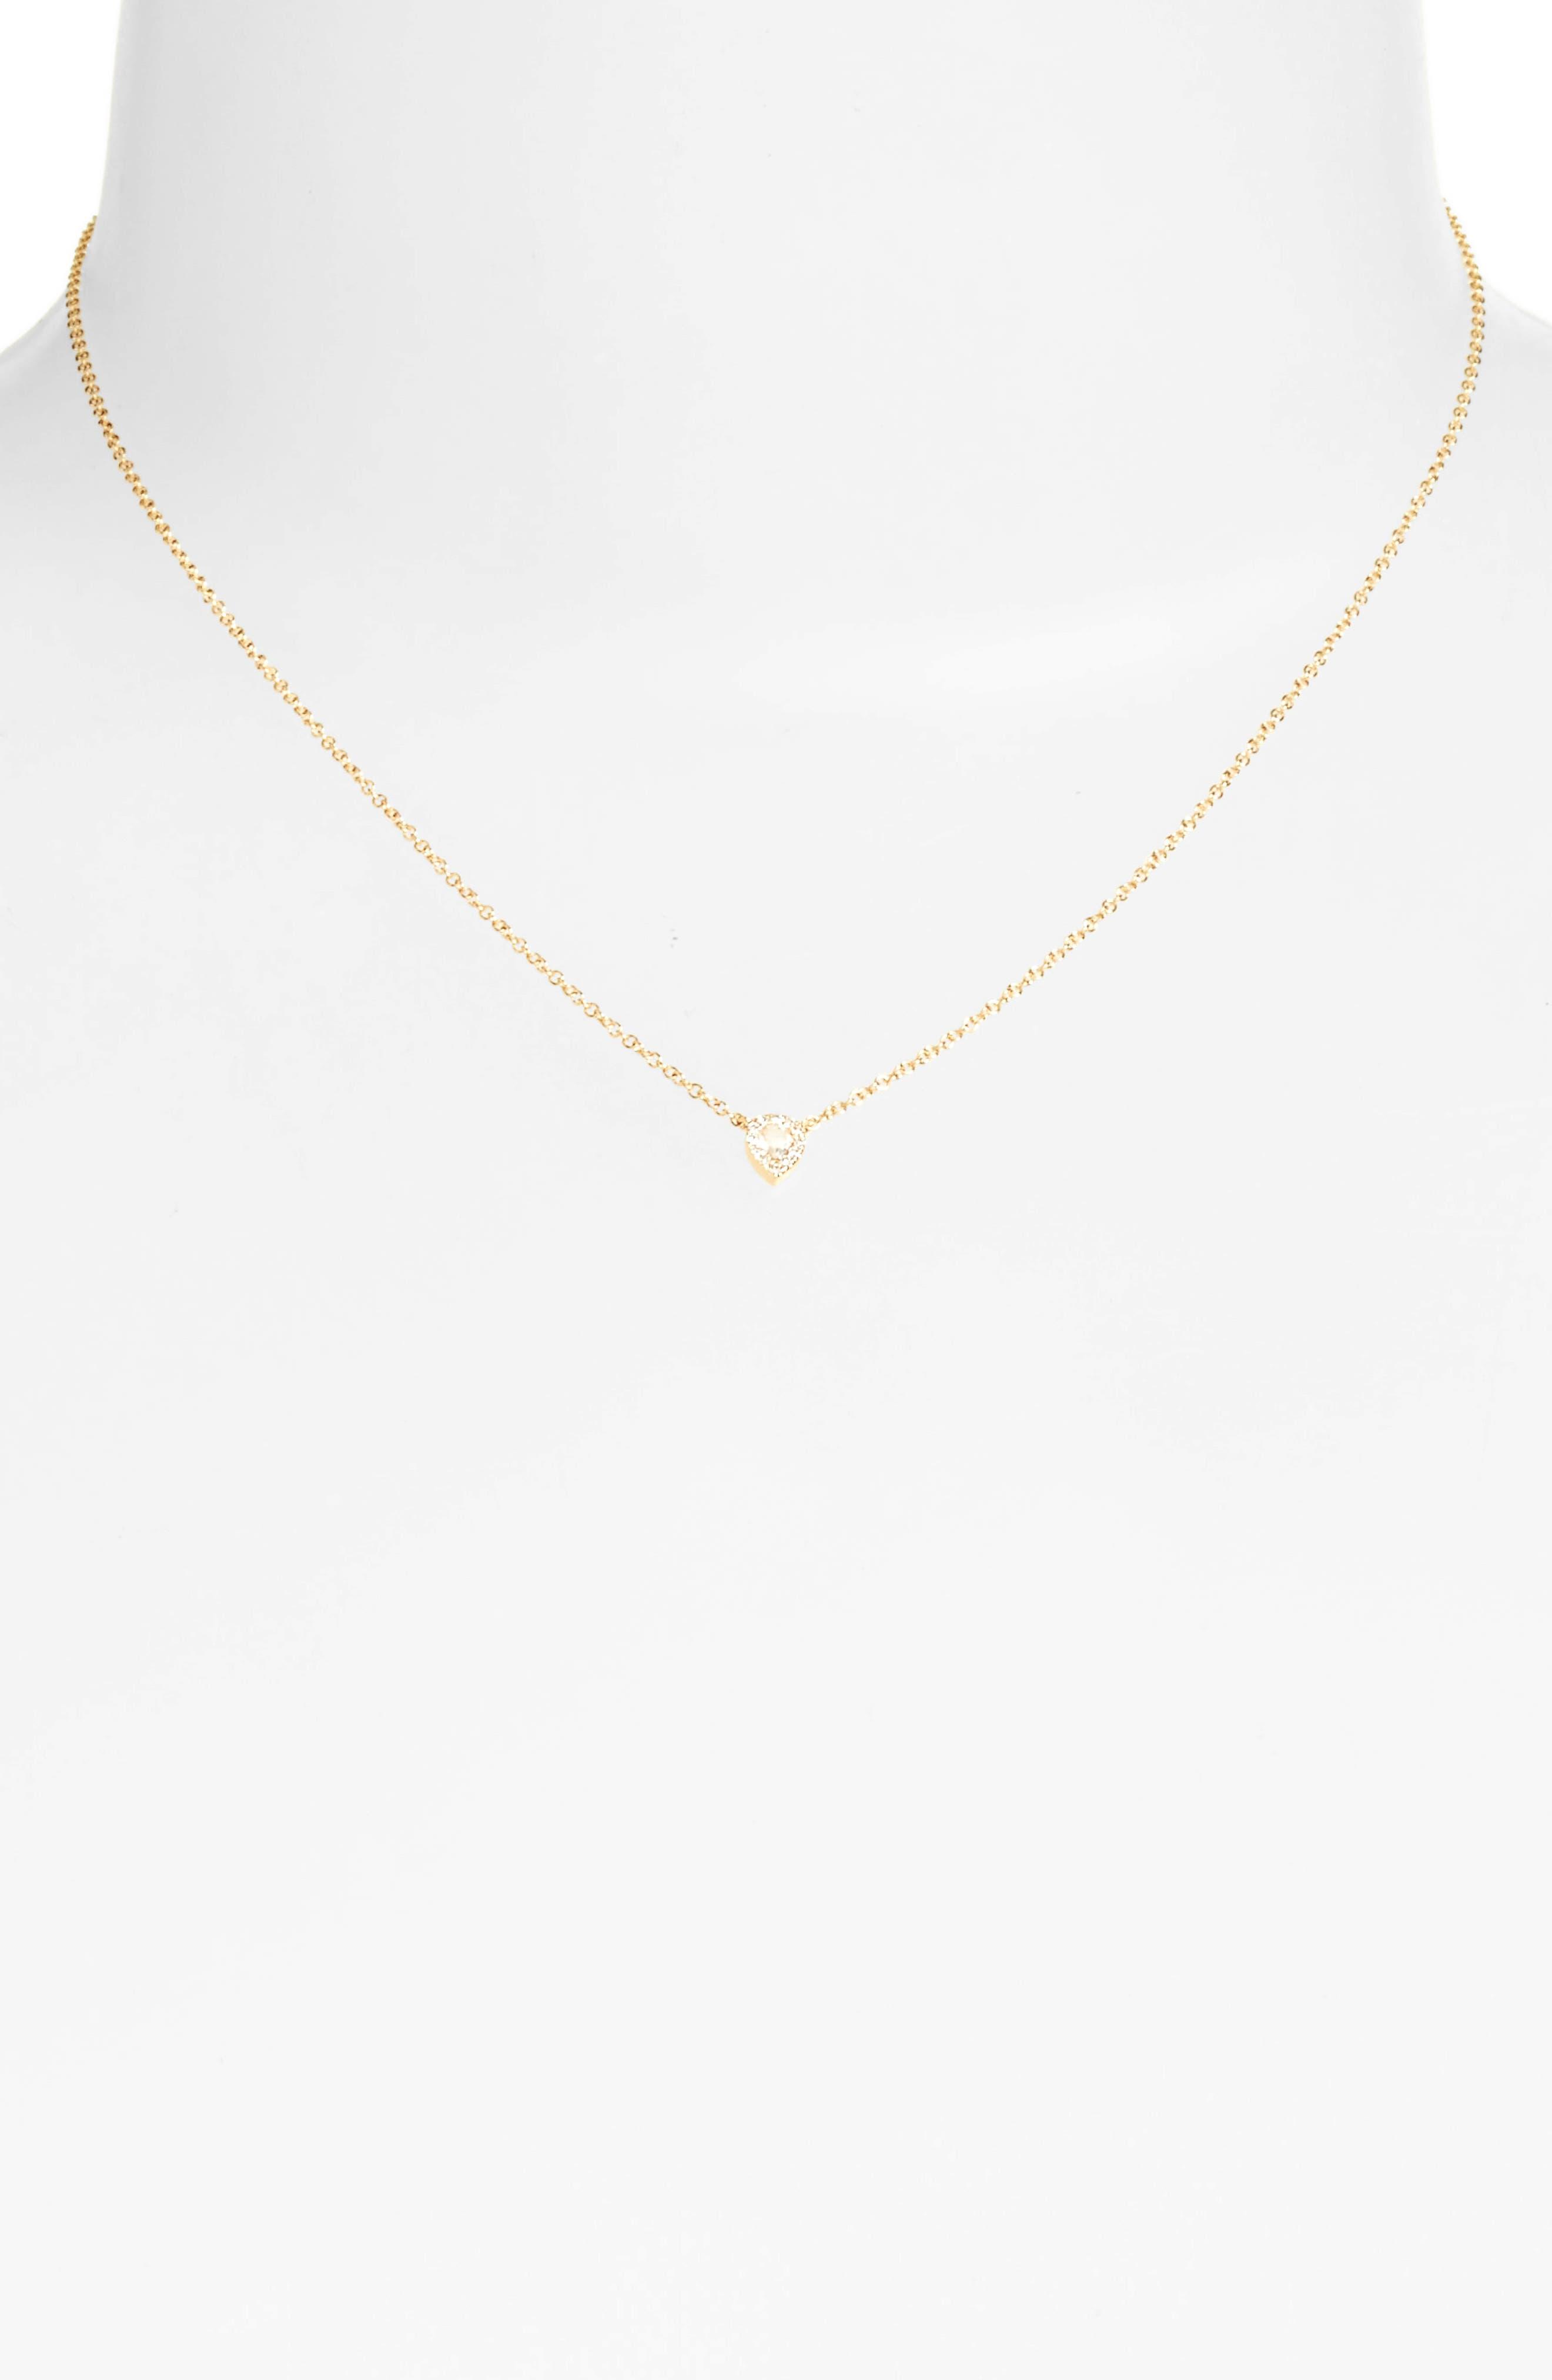 Diamond & Topaz Teardrop Pendant Necklace,                             Alternate thumbnail 2, color,                             YELLOW GOLD